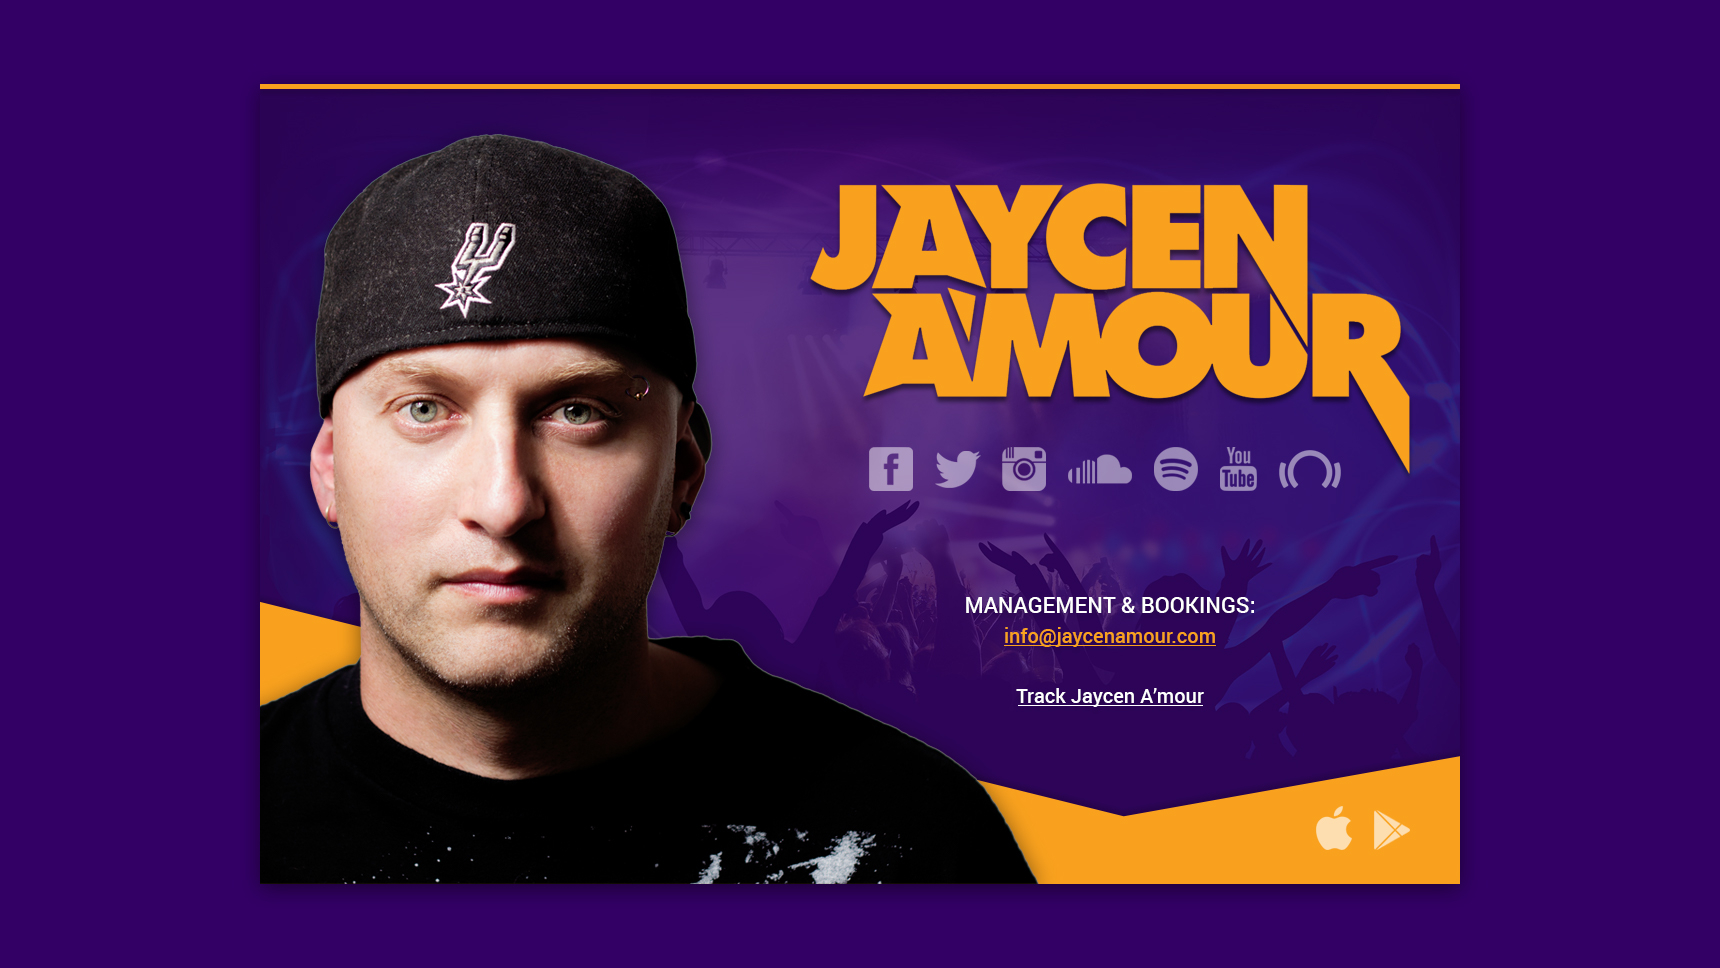 DJ Jaycen A'mour